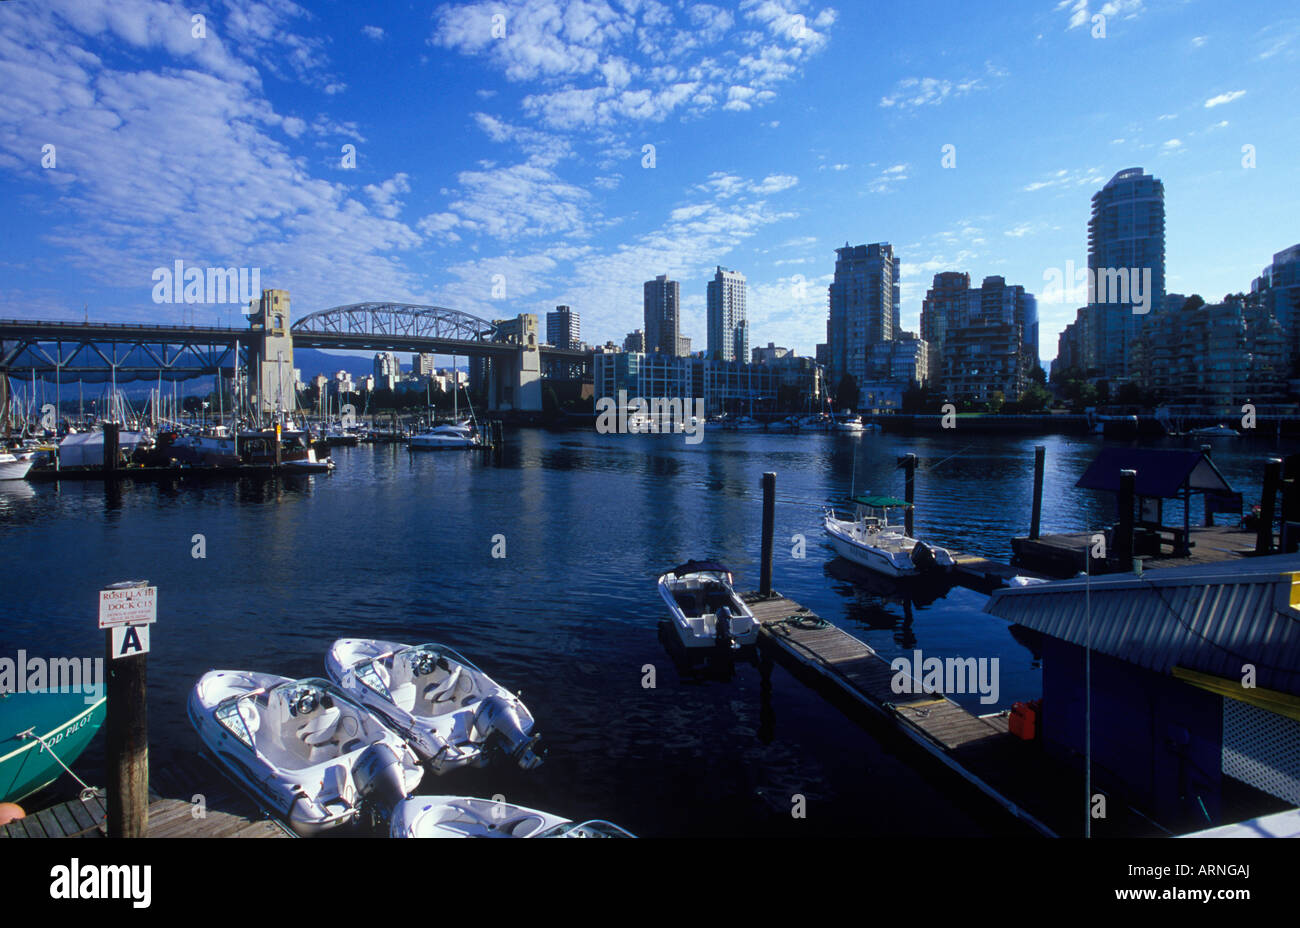 False creek with rental boats, Burrard Bridge in distance, Vancouver, British Columbia, Canada. Stock Photo